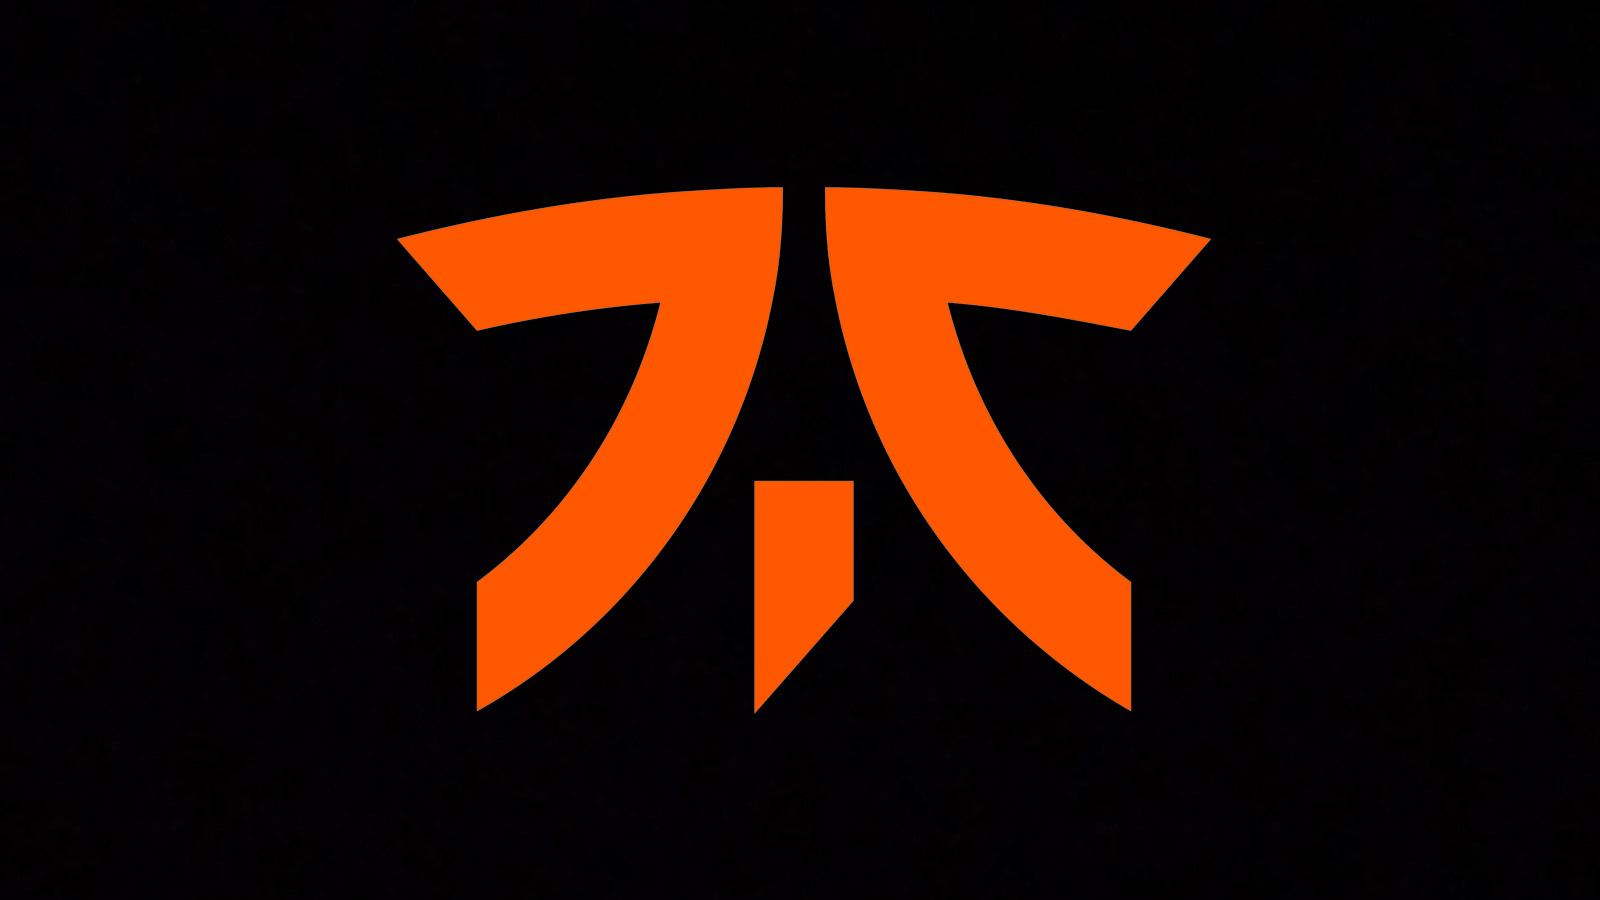 New Fnatic logo leaked ahead of rebrand